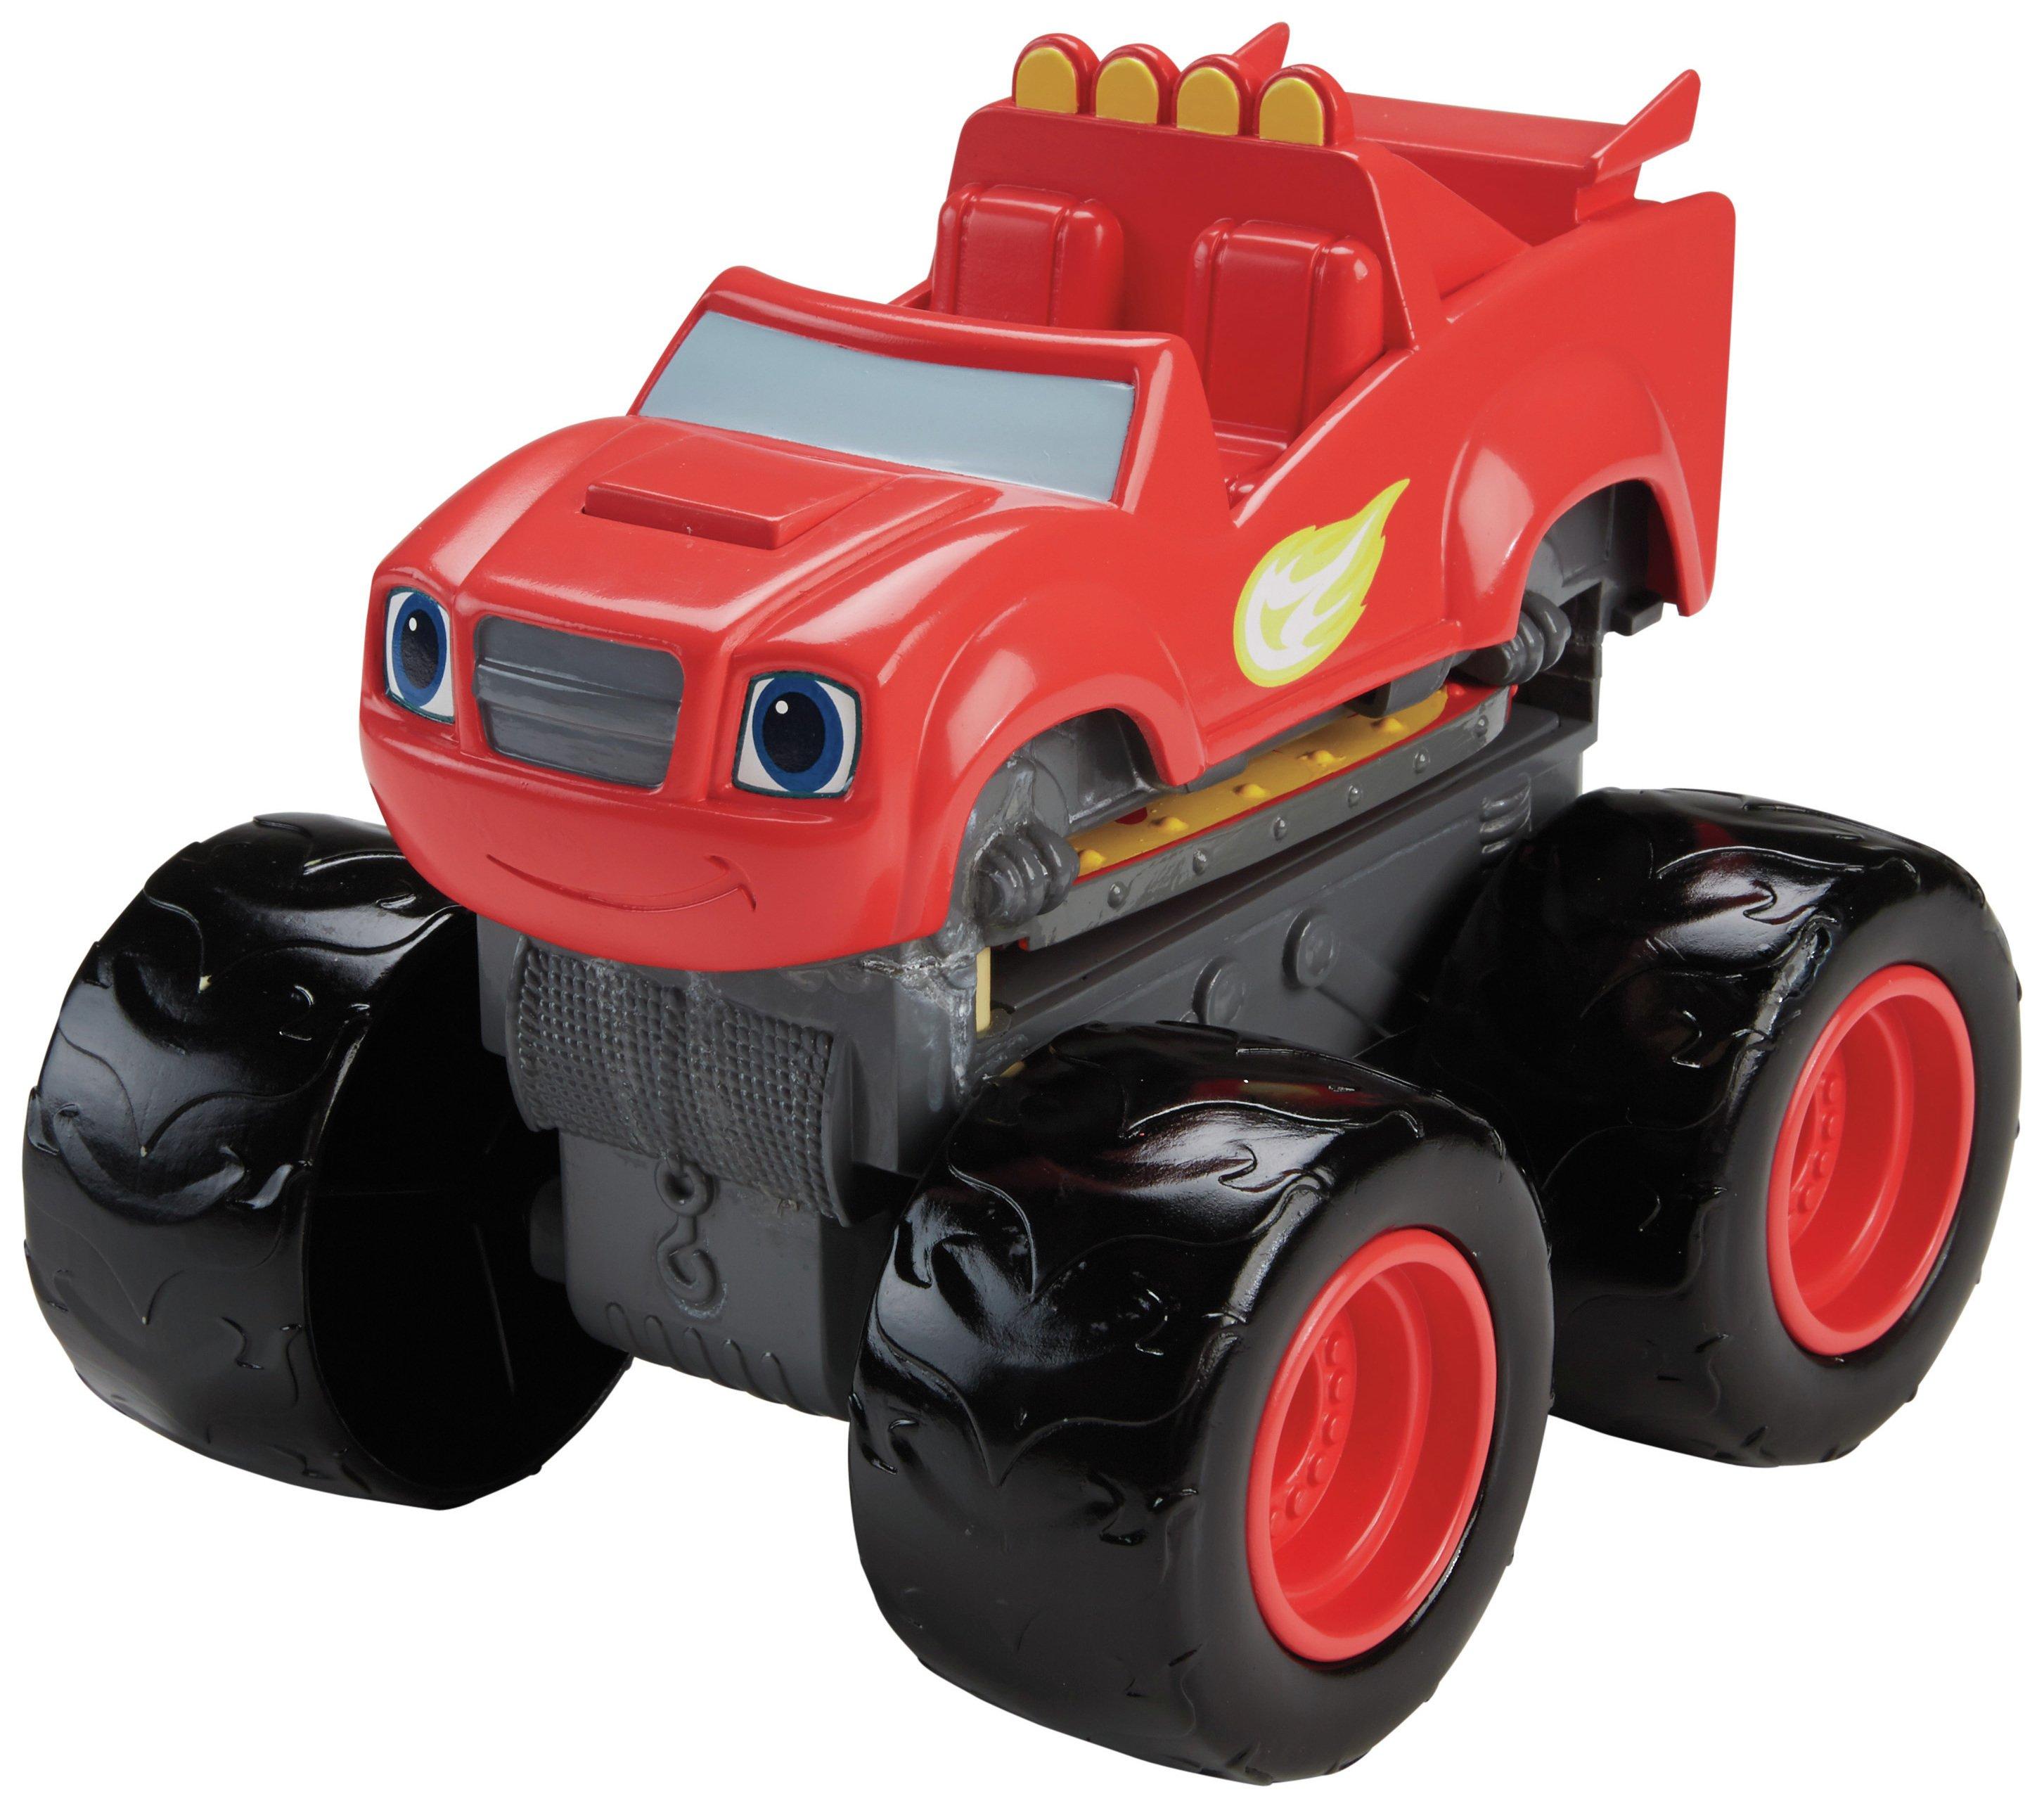 Image of Fisher-Price Blaze Transforming Blaze Jet Activity Toy